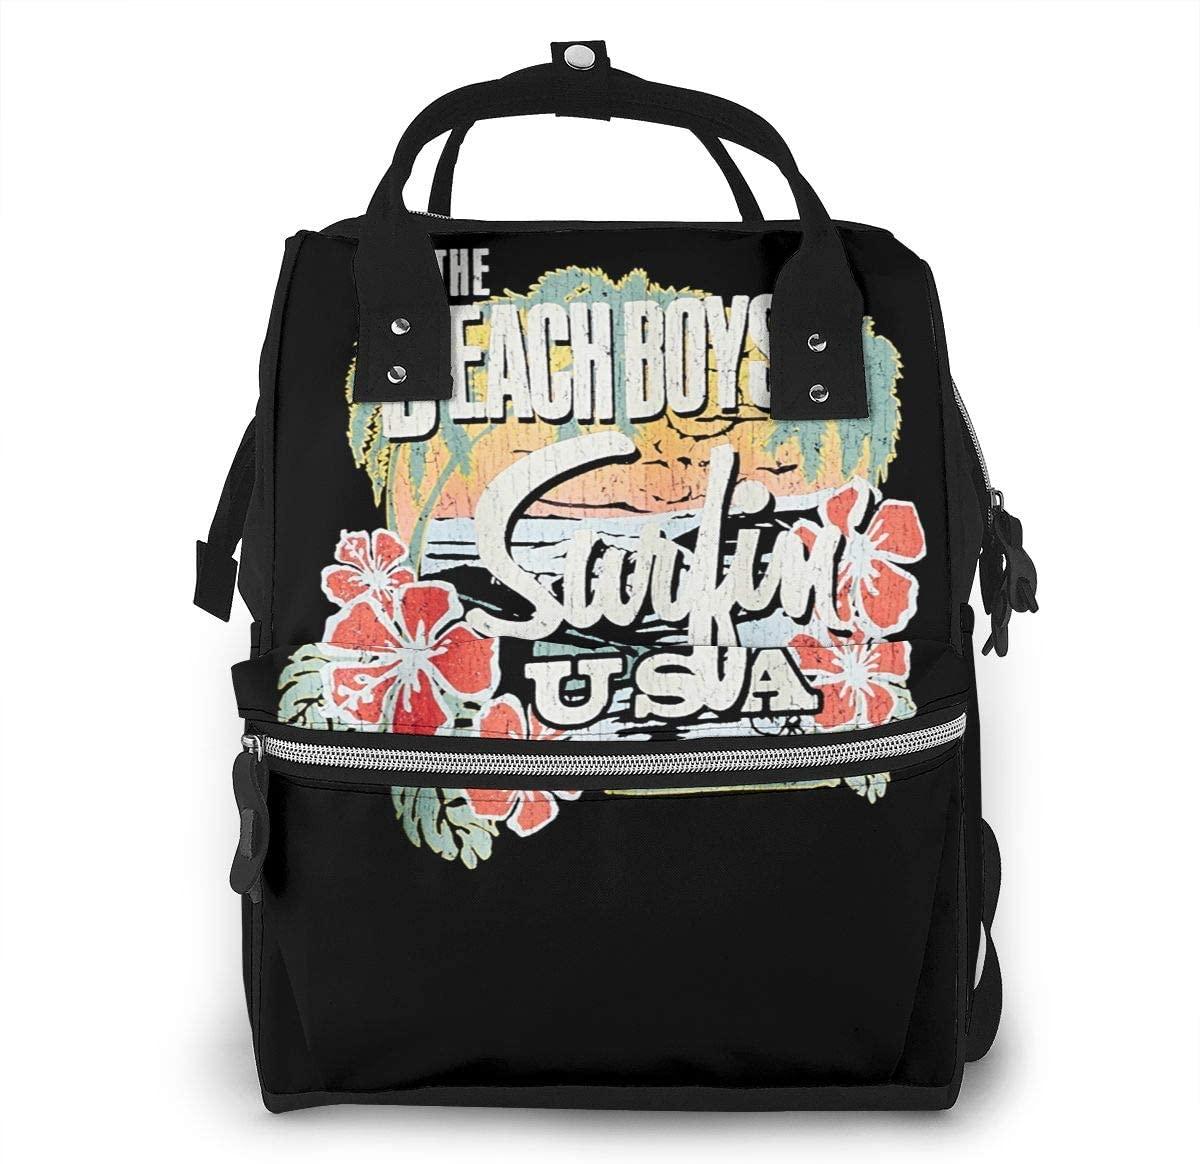 Sherrygeoffrey Beach Boys Surfin USA Tropical Diaper Backpack Large Capacity Travel Bag